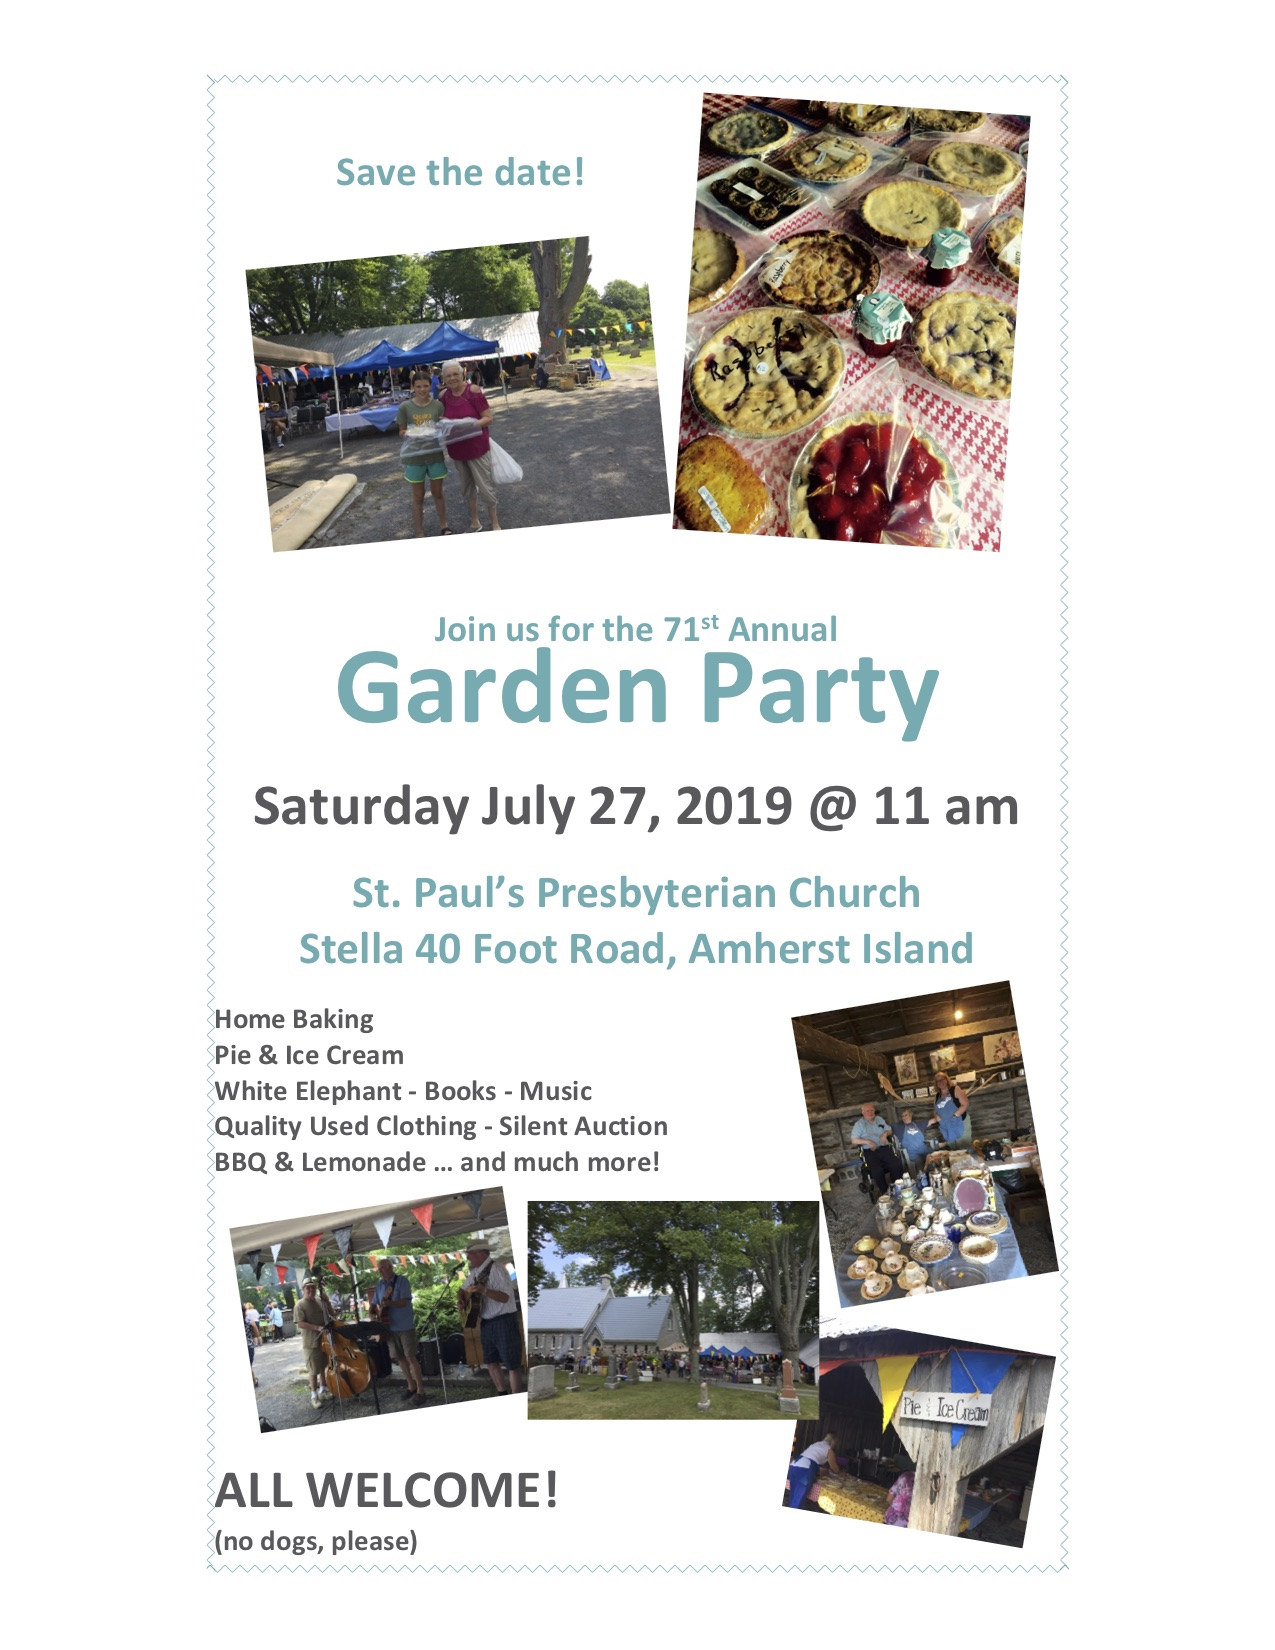 Garden Party @ St Paul's Presbyterian Church